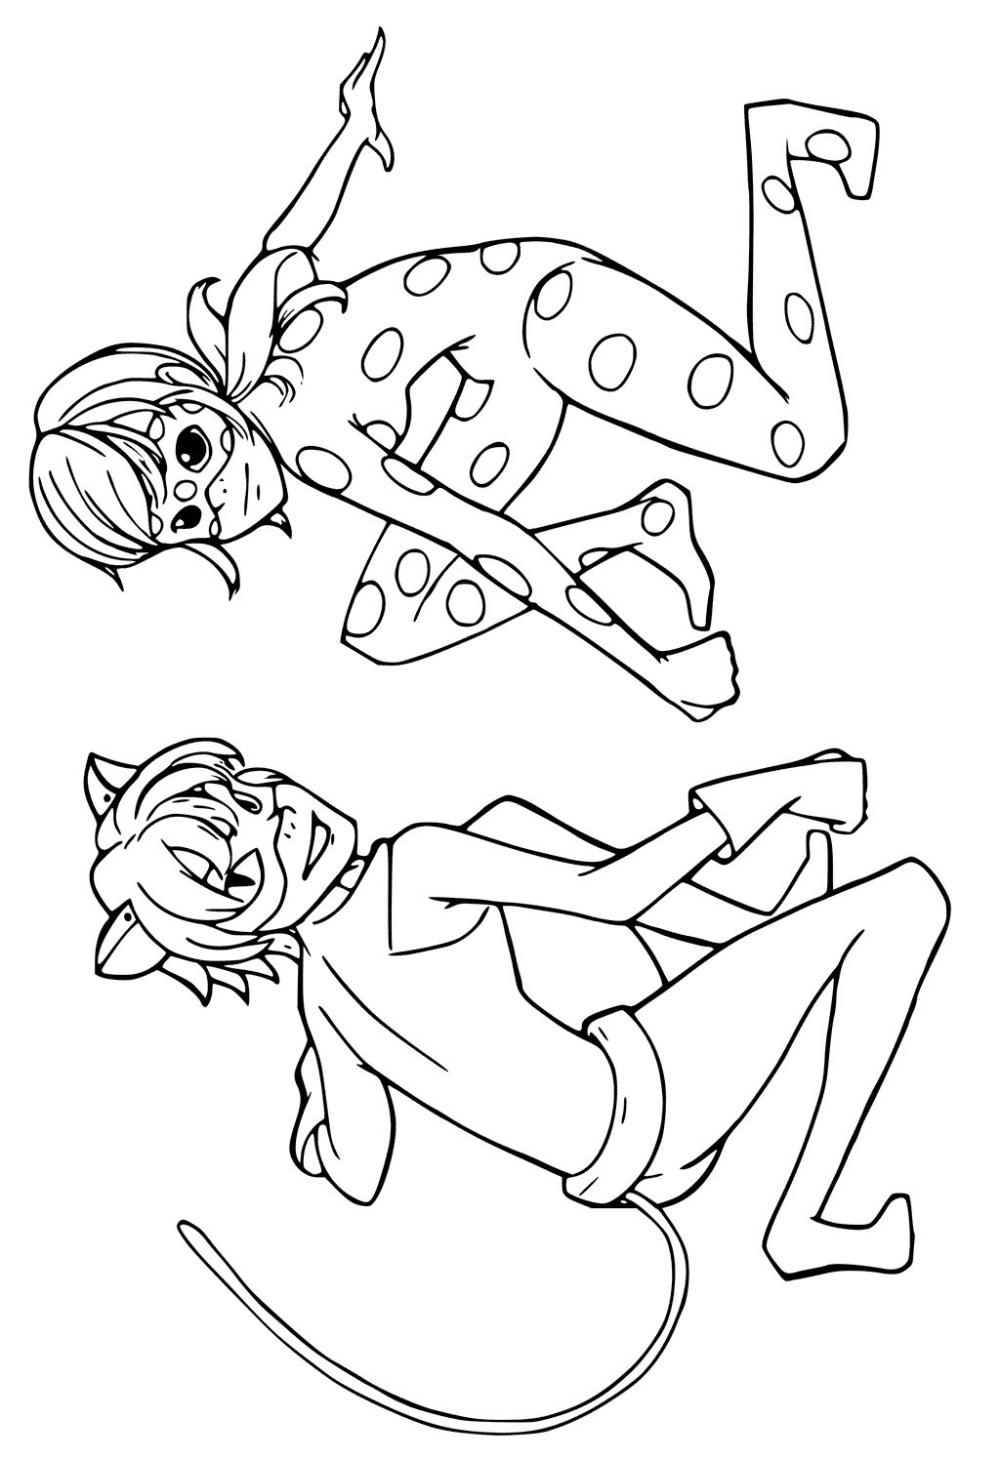 Miraculum Biedronka Czarny Kot Kolorowanka In 2020 Ladybug Coloring Page Coloring Pages Bug Coloring Pages